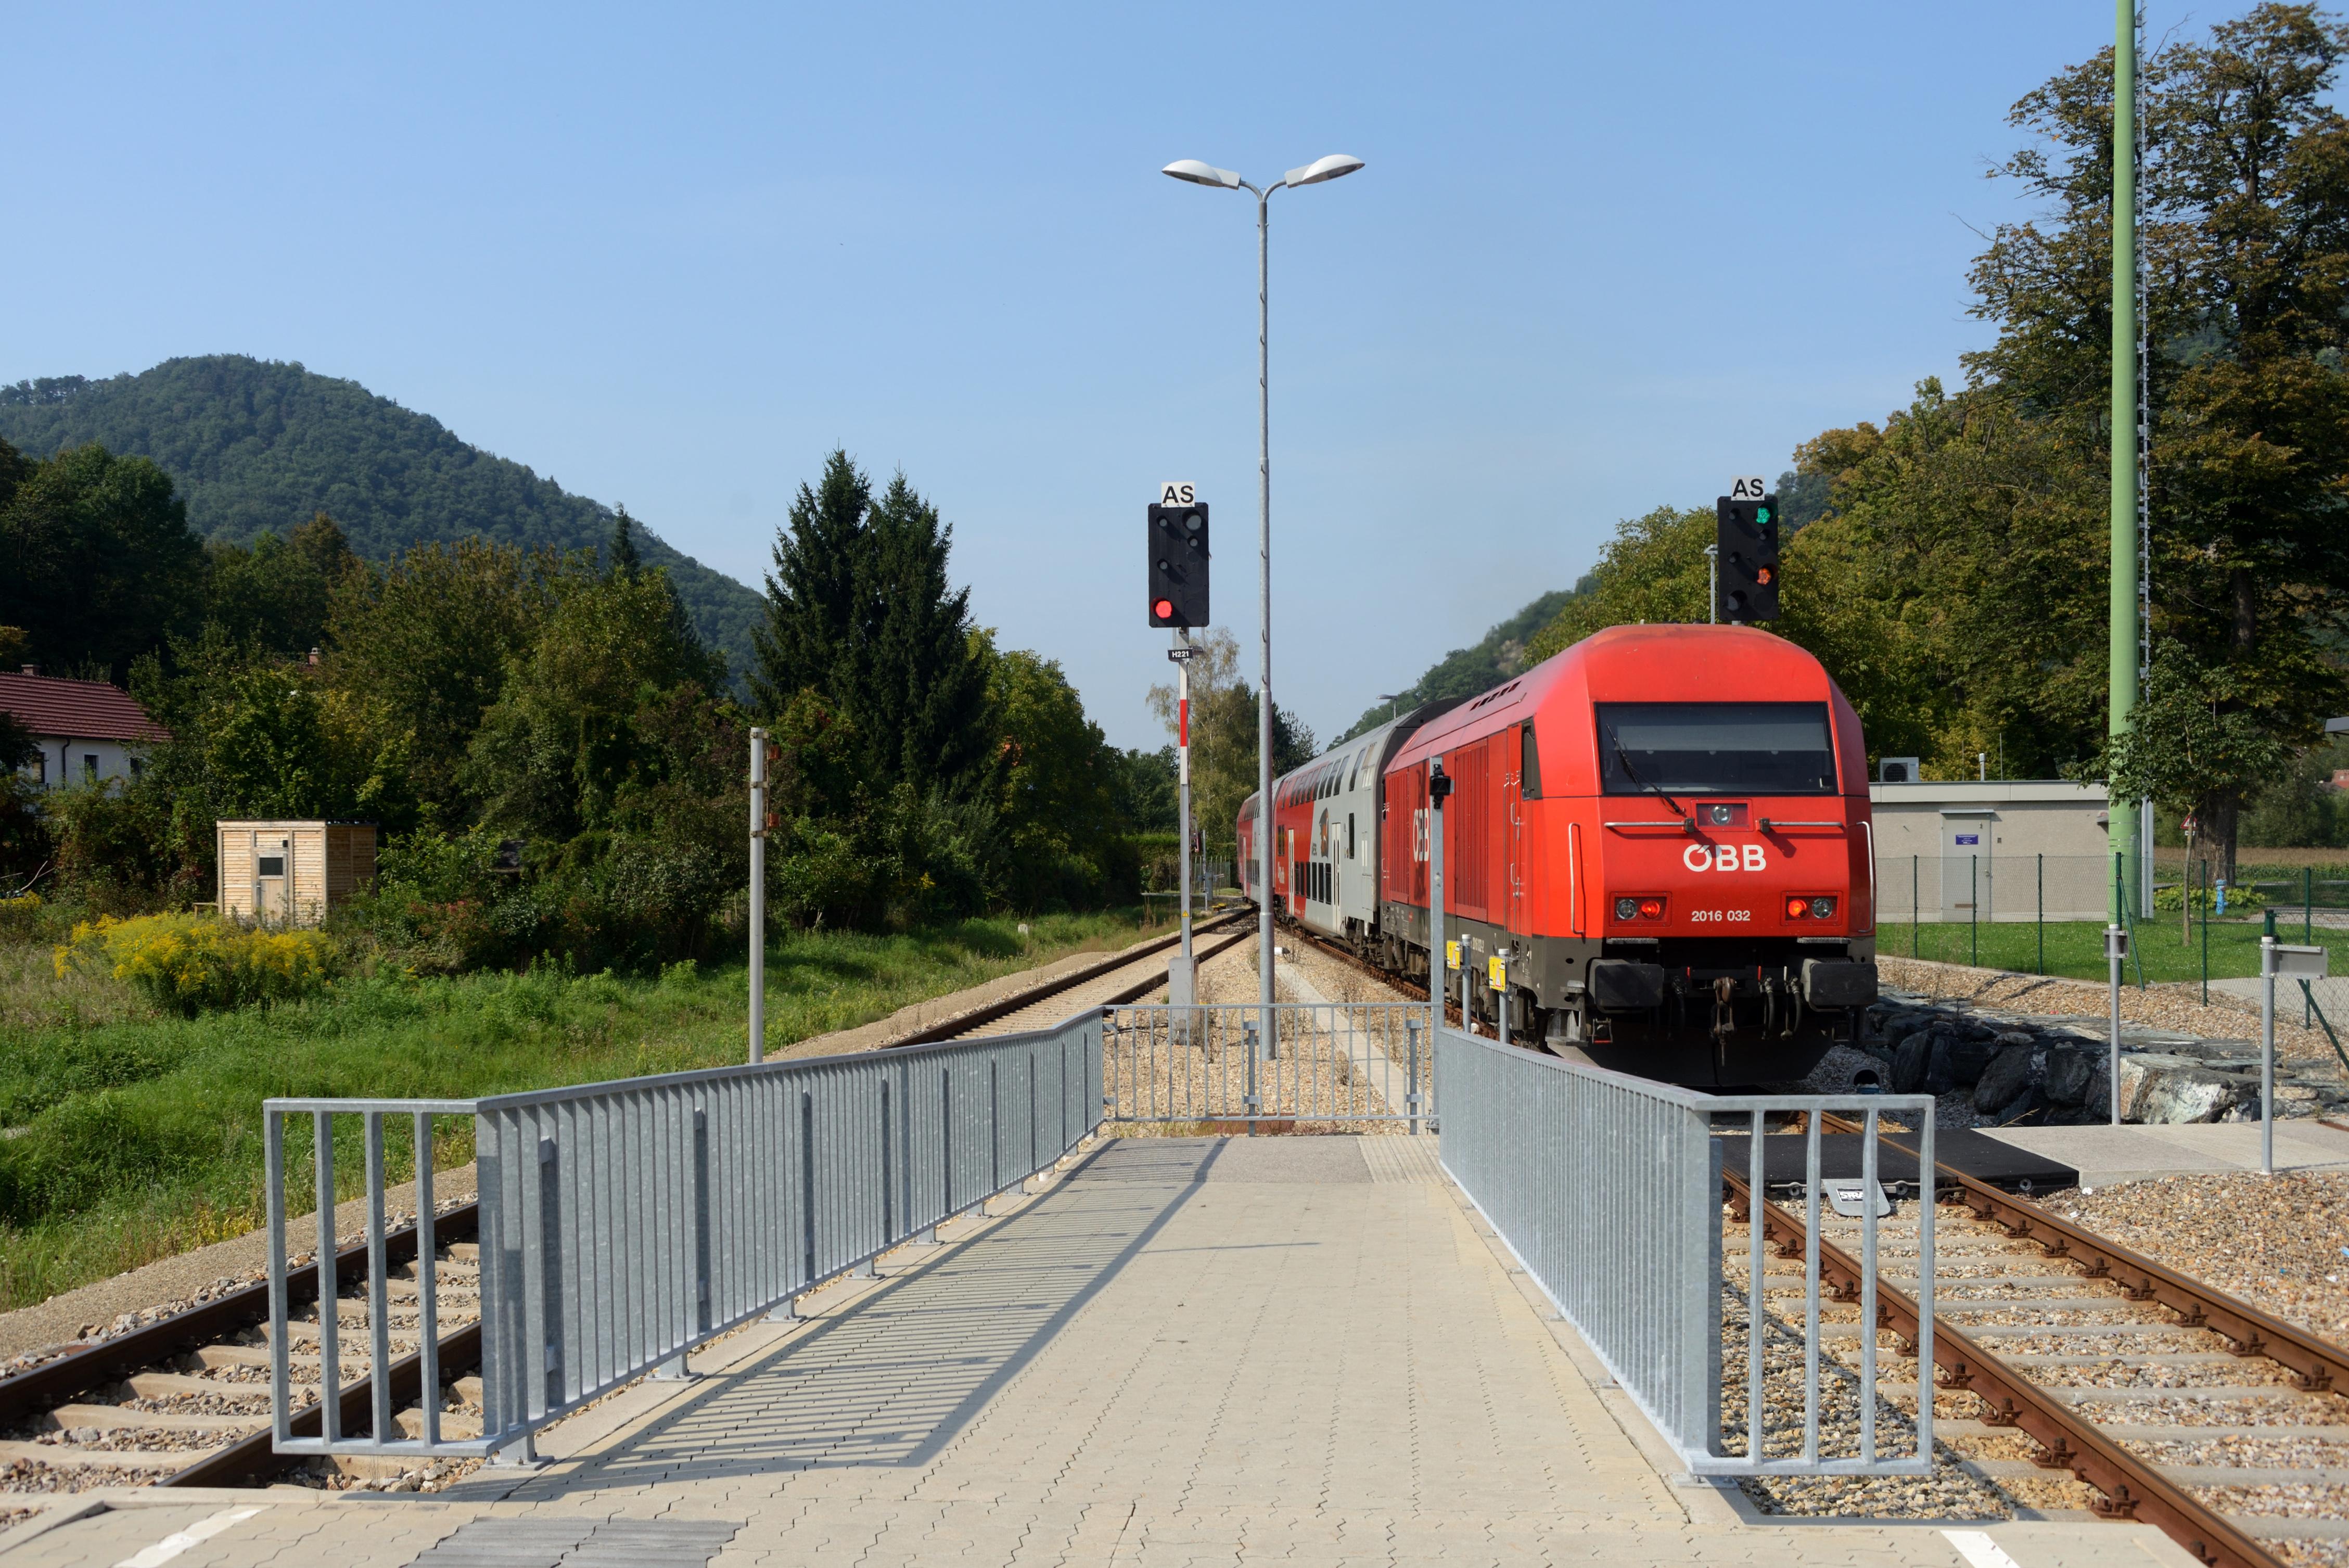 File Bahnhof Paudorf Bahnsteig Zugang Jpg Wikimedia Commons